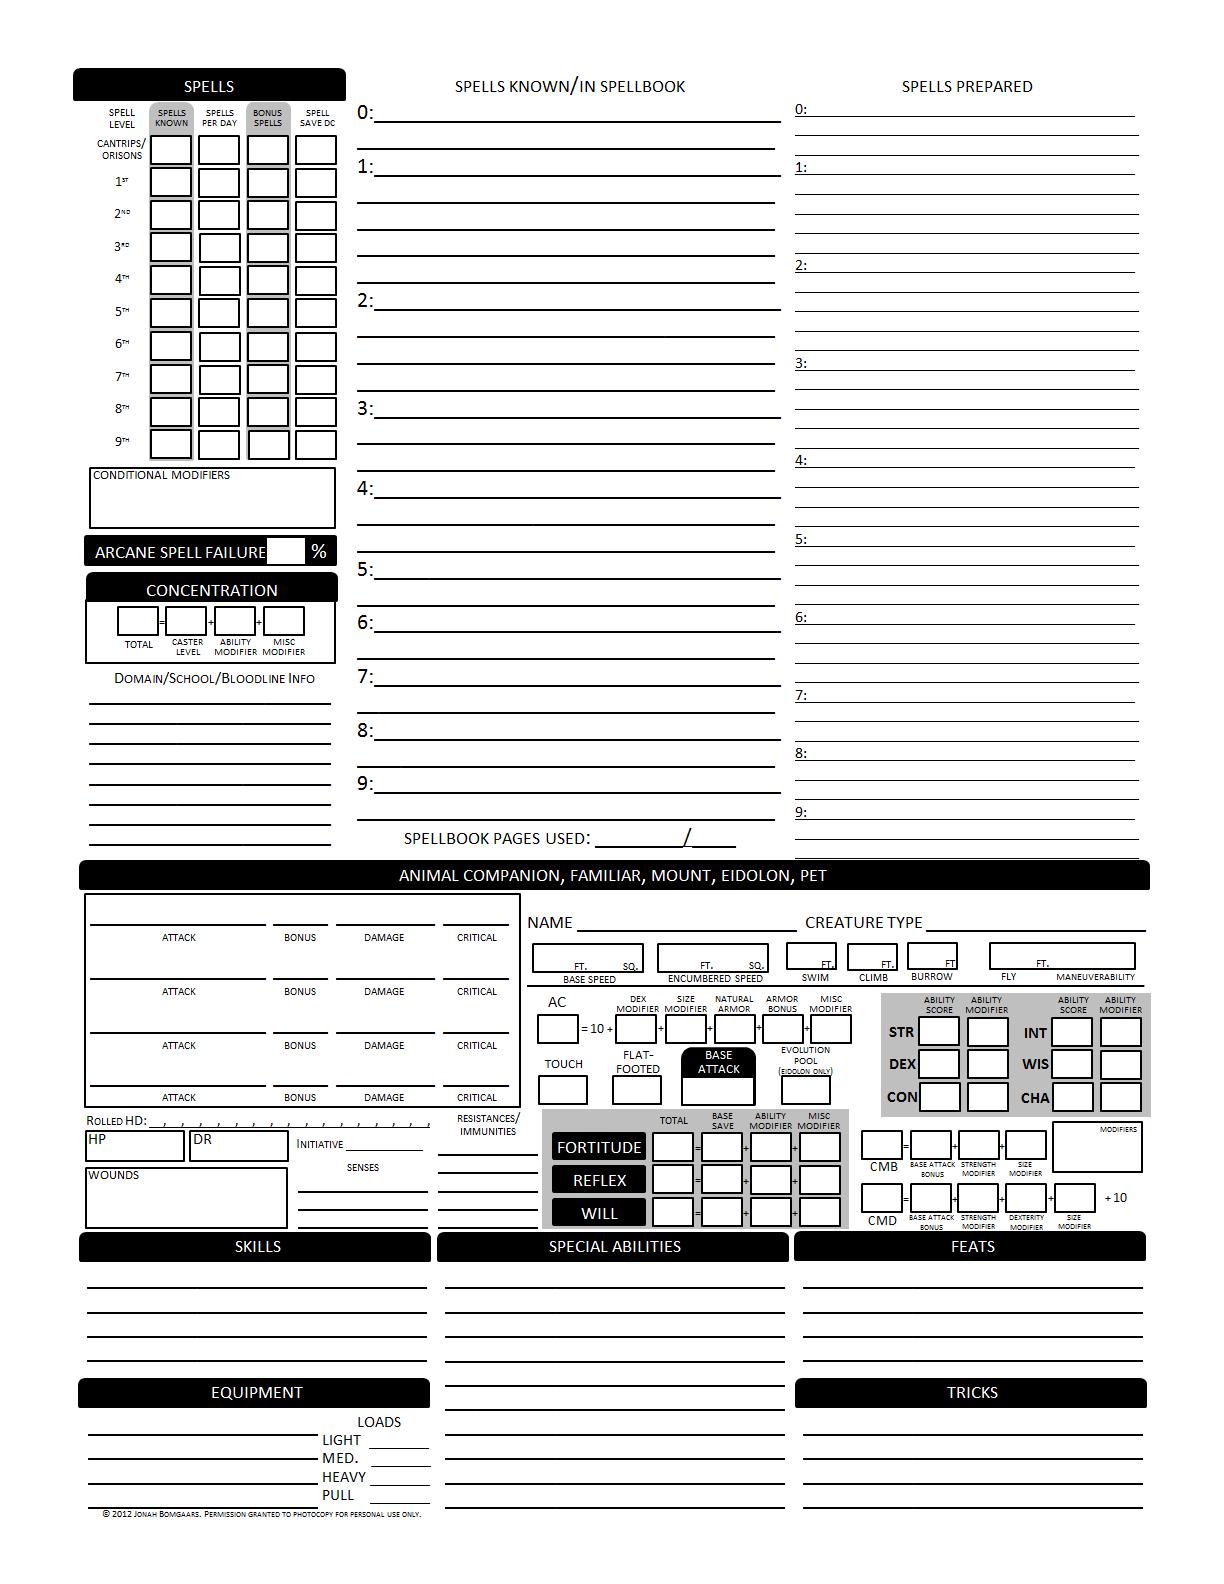 d20 Despot: Improved Character Sheet v2 0